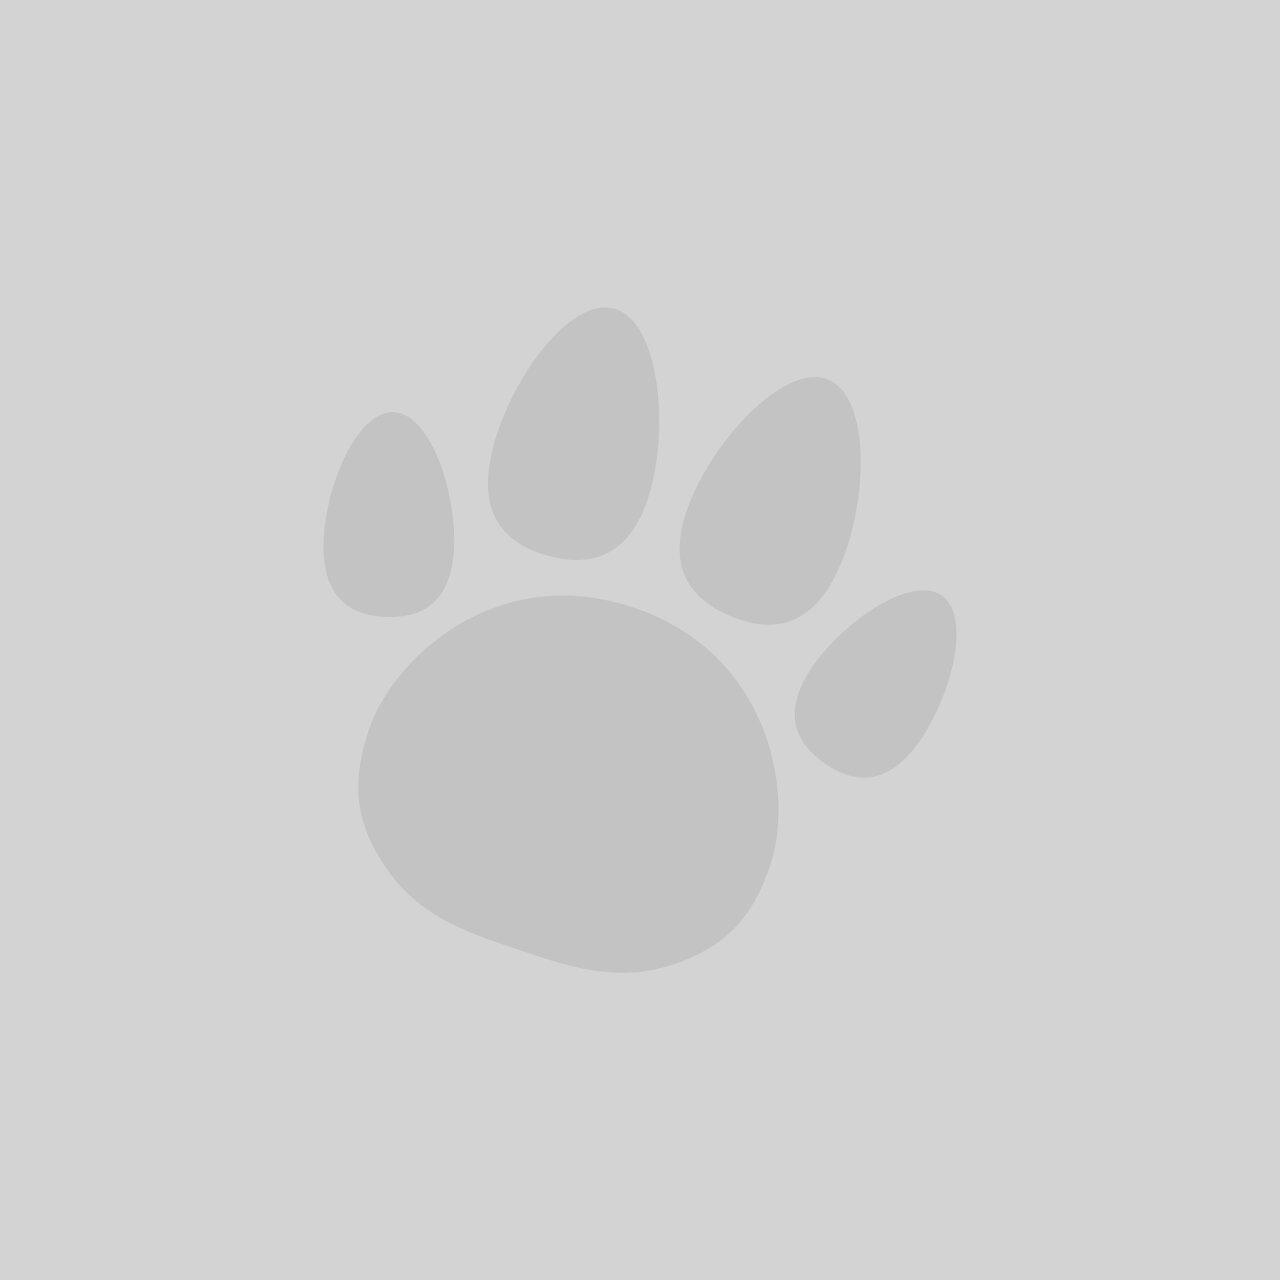 Butcher's Puppy Perfect Dog Food Tins 6 x 400g